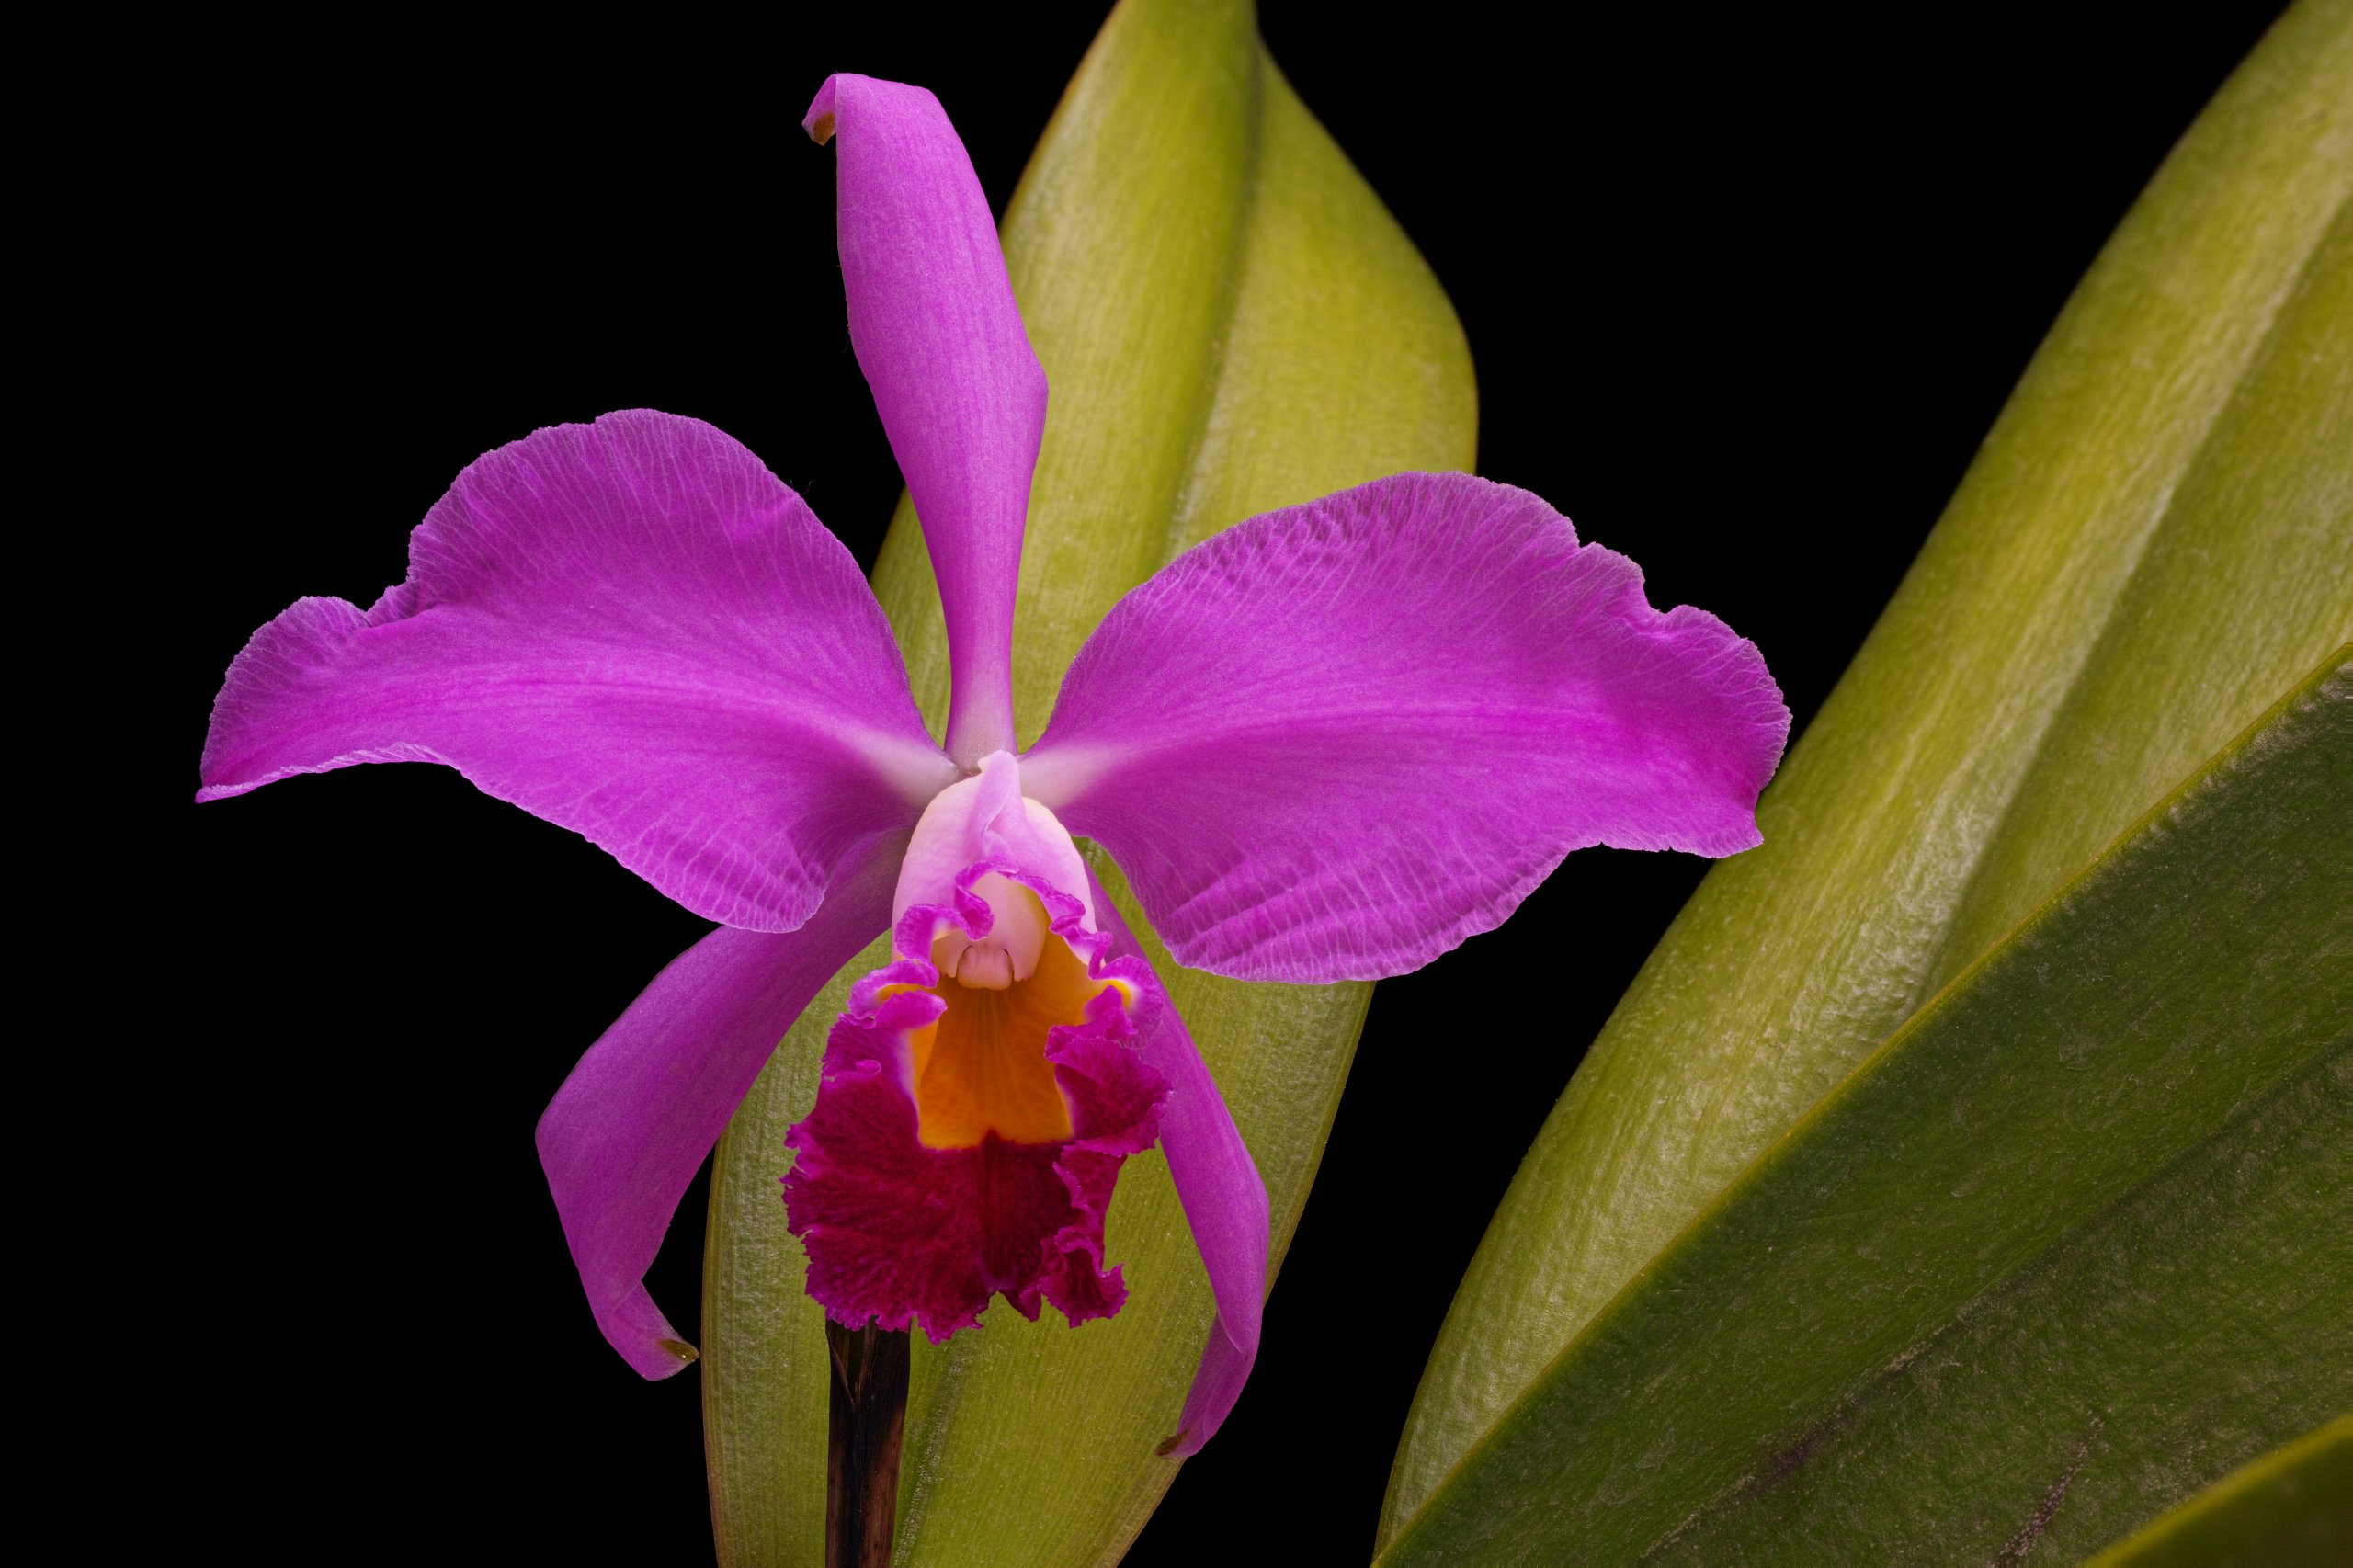 Cattleya eldorado 'M. Ito' AM-AOS BM-JOGA.tif flower.jpg